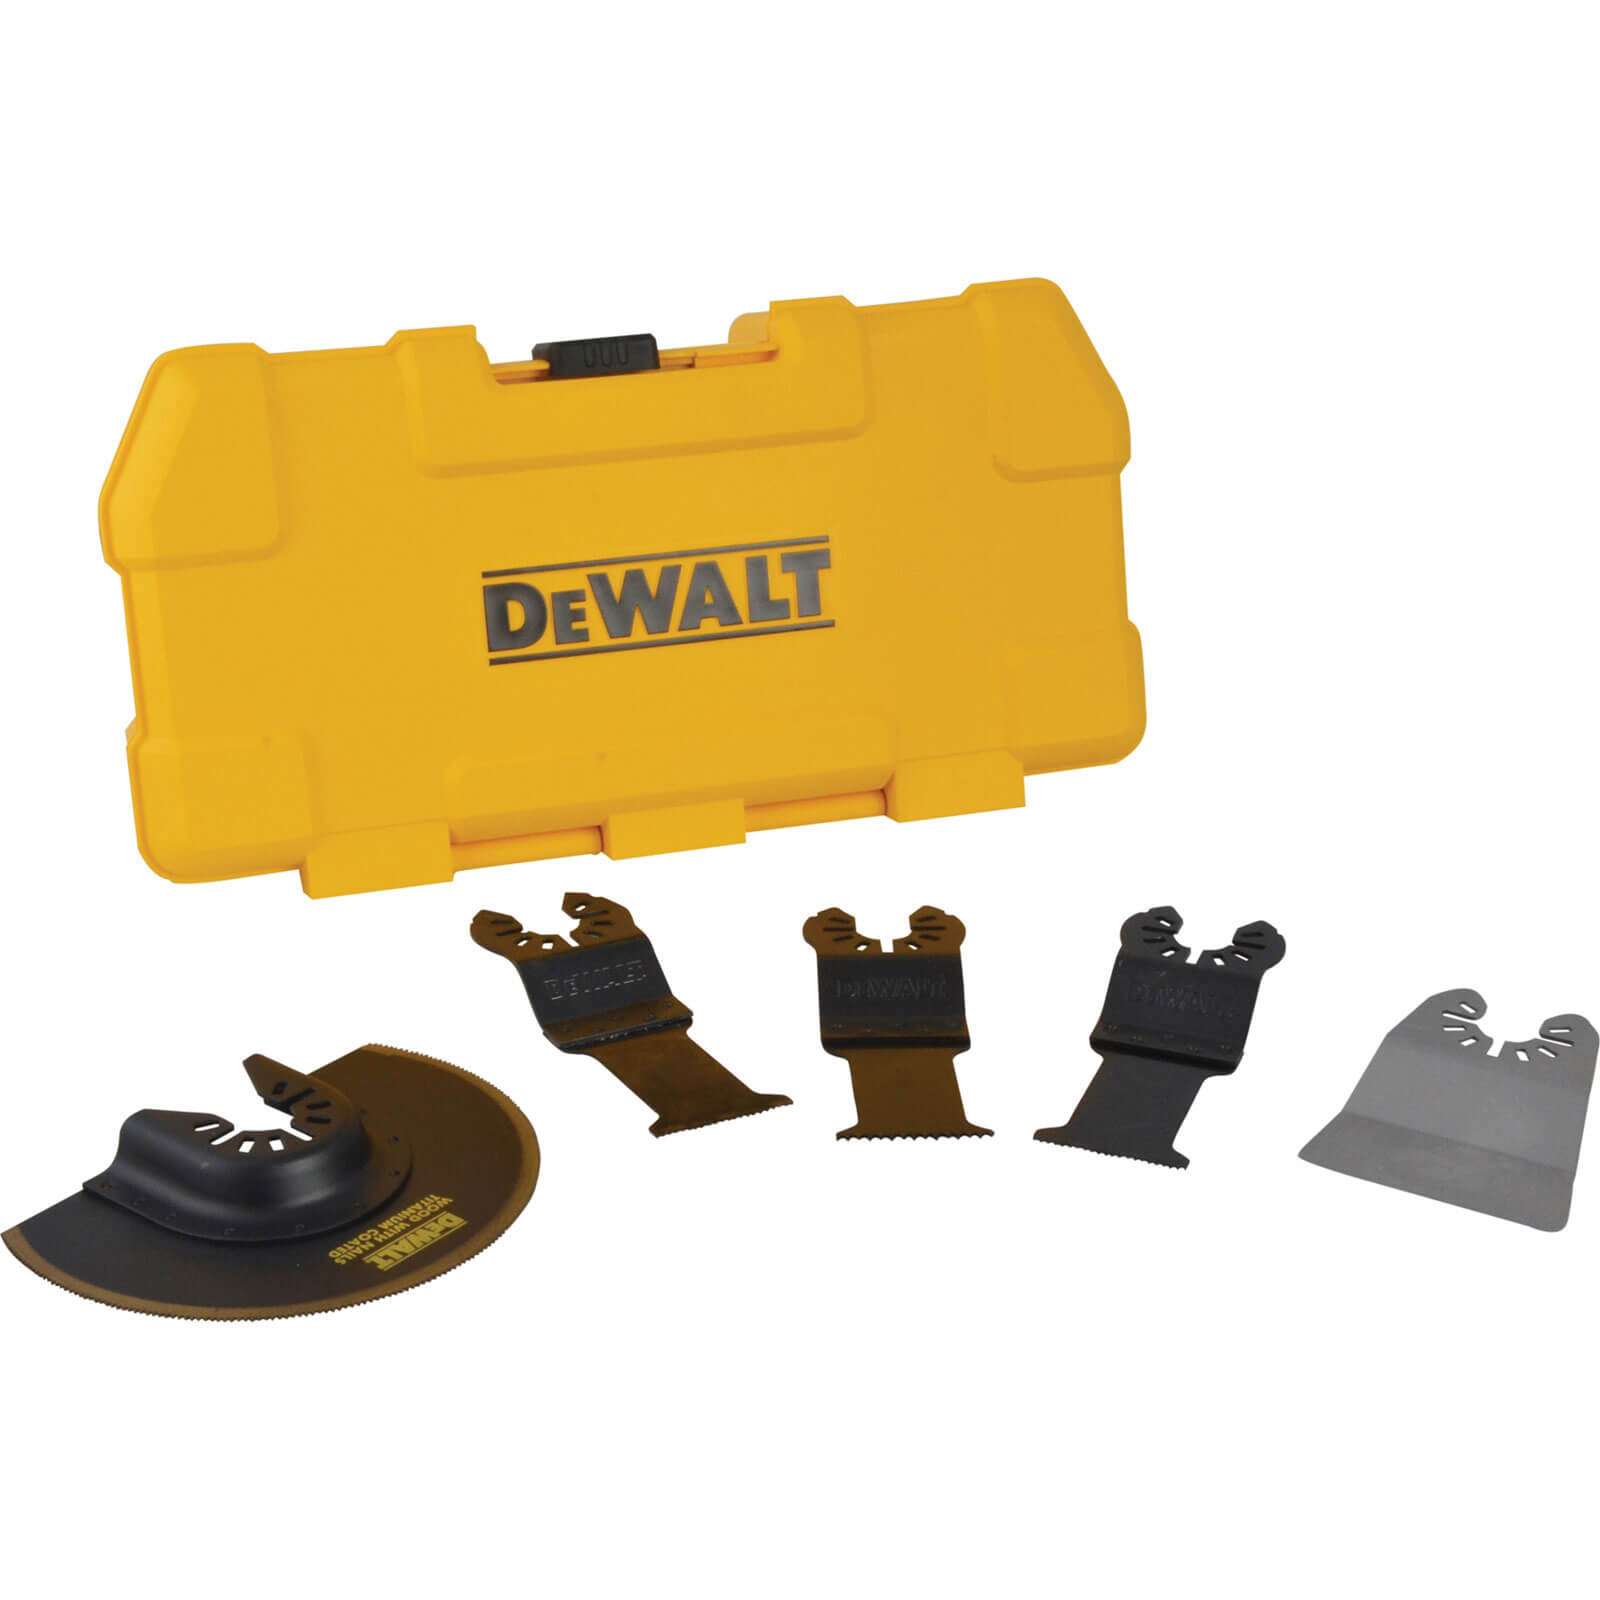 Image of DeWalt 5 Piece Oscillating Multi Tool Blade Set